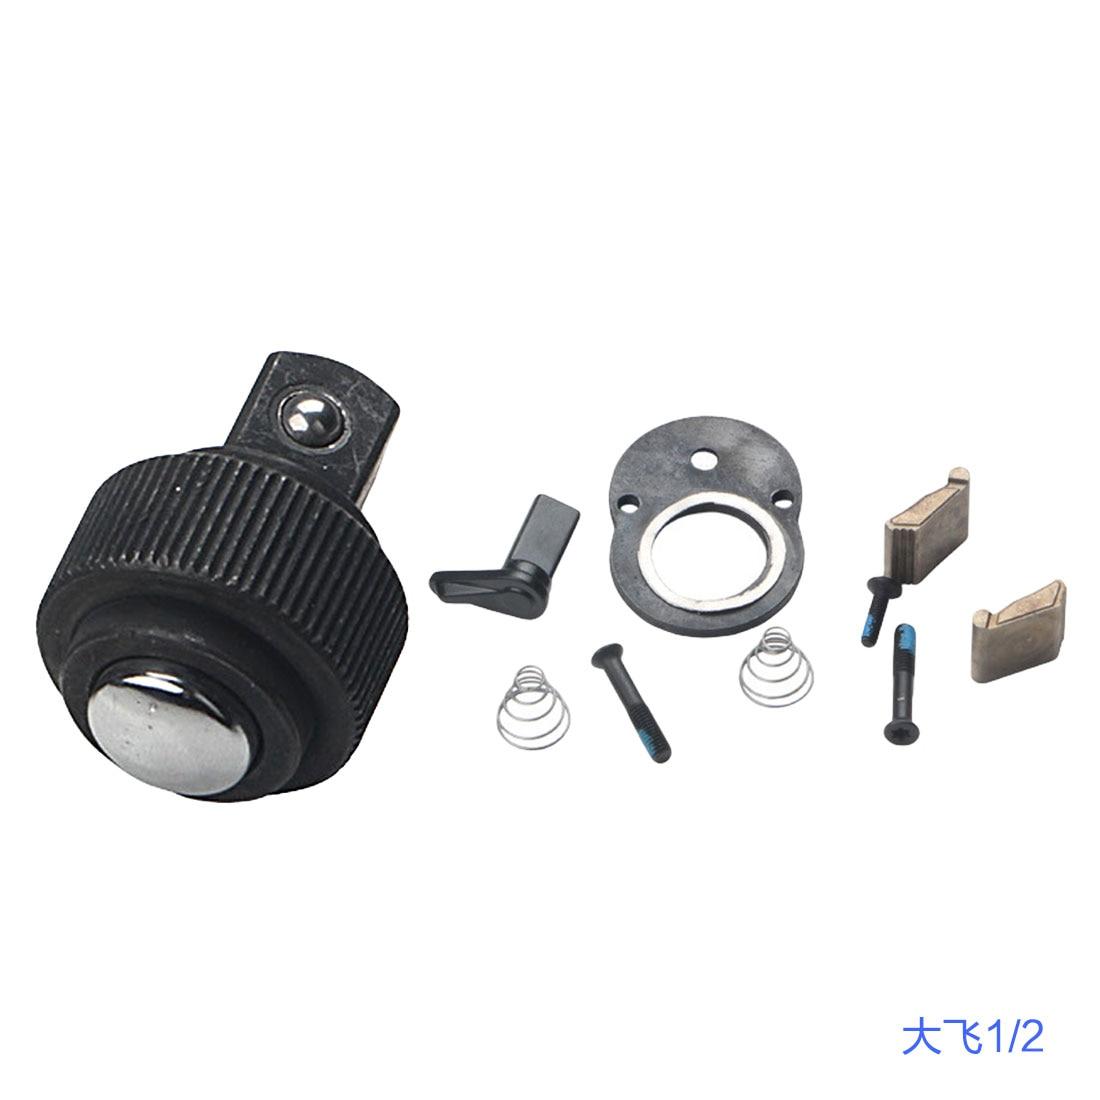 "Repair Kit 1/4"" 3/8"" 1/2"" 72 Teeth Ratchet Socket Wrench Repair Accessories Ratchet Wrench Part Kit Hand Tool"